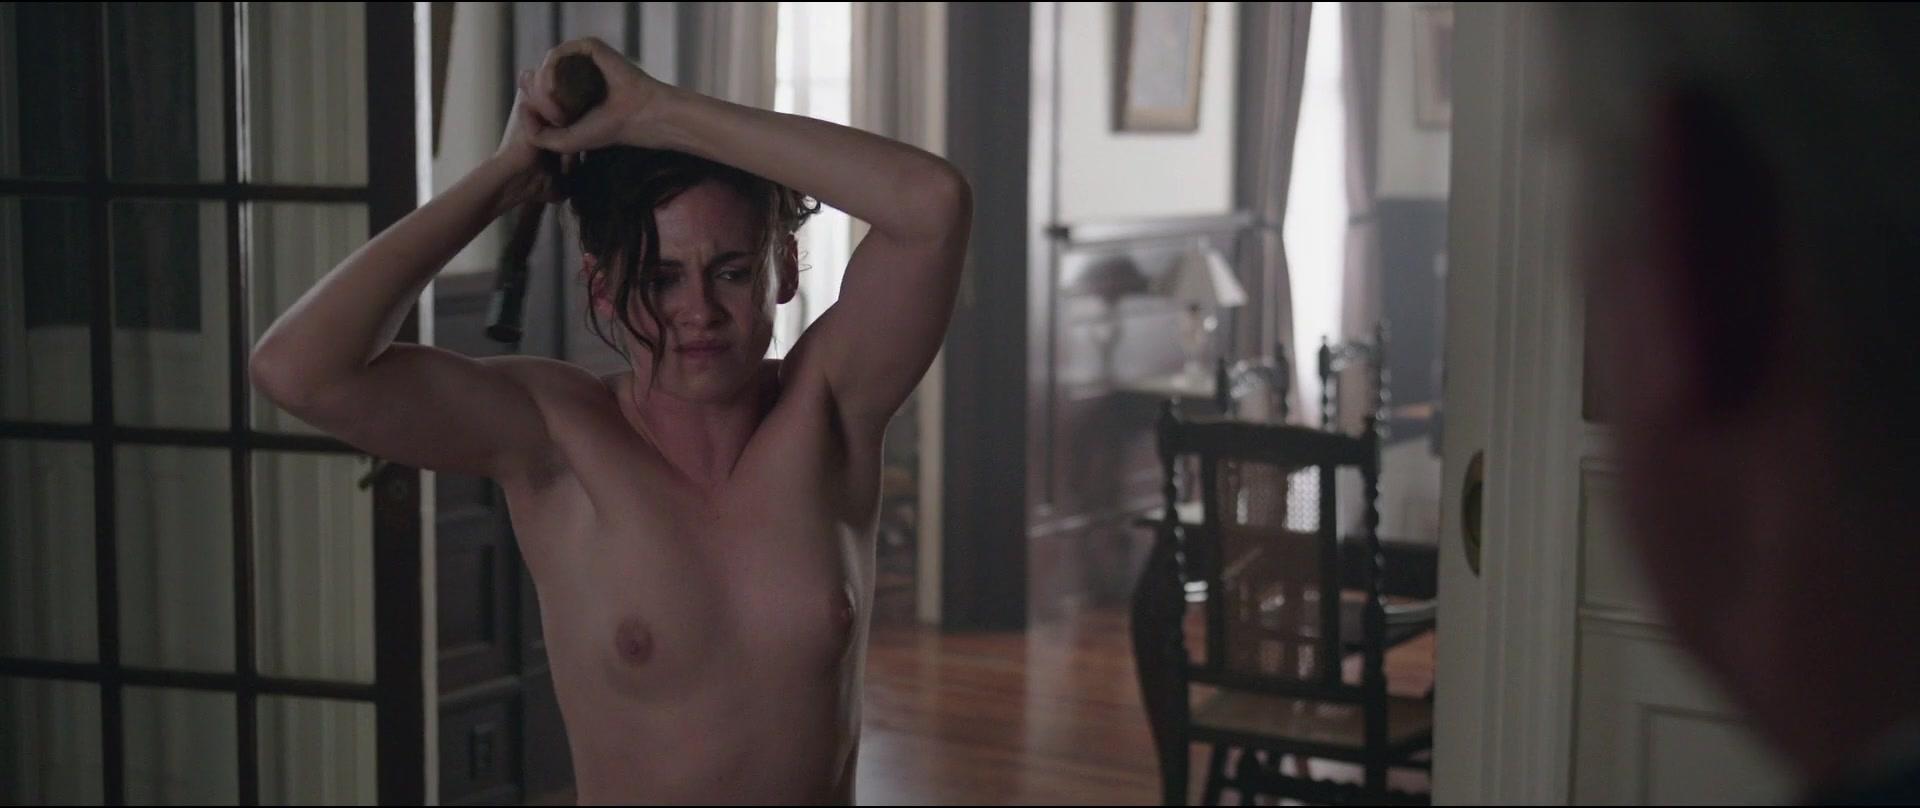 Kristen stewart nude sex scenes